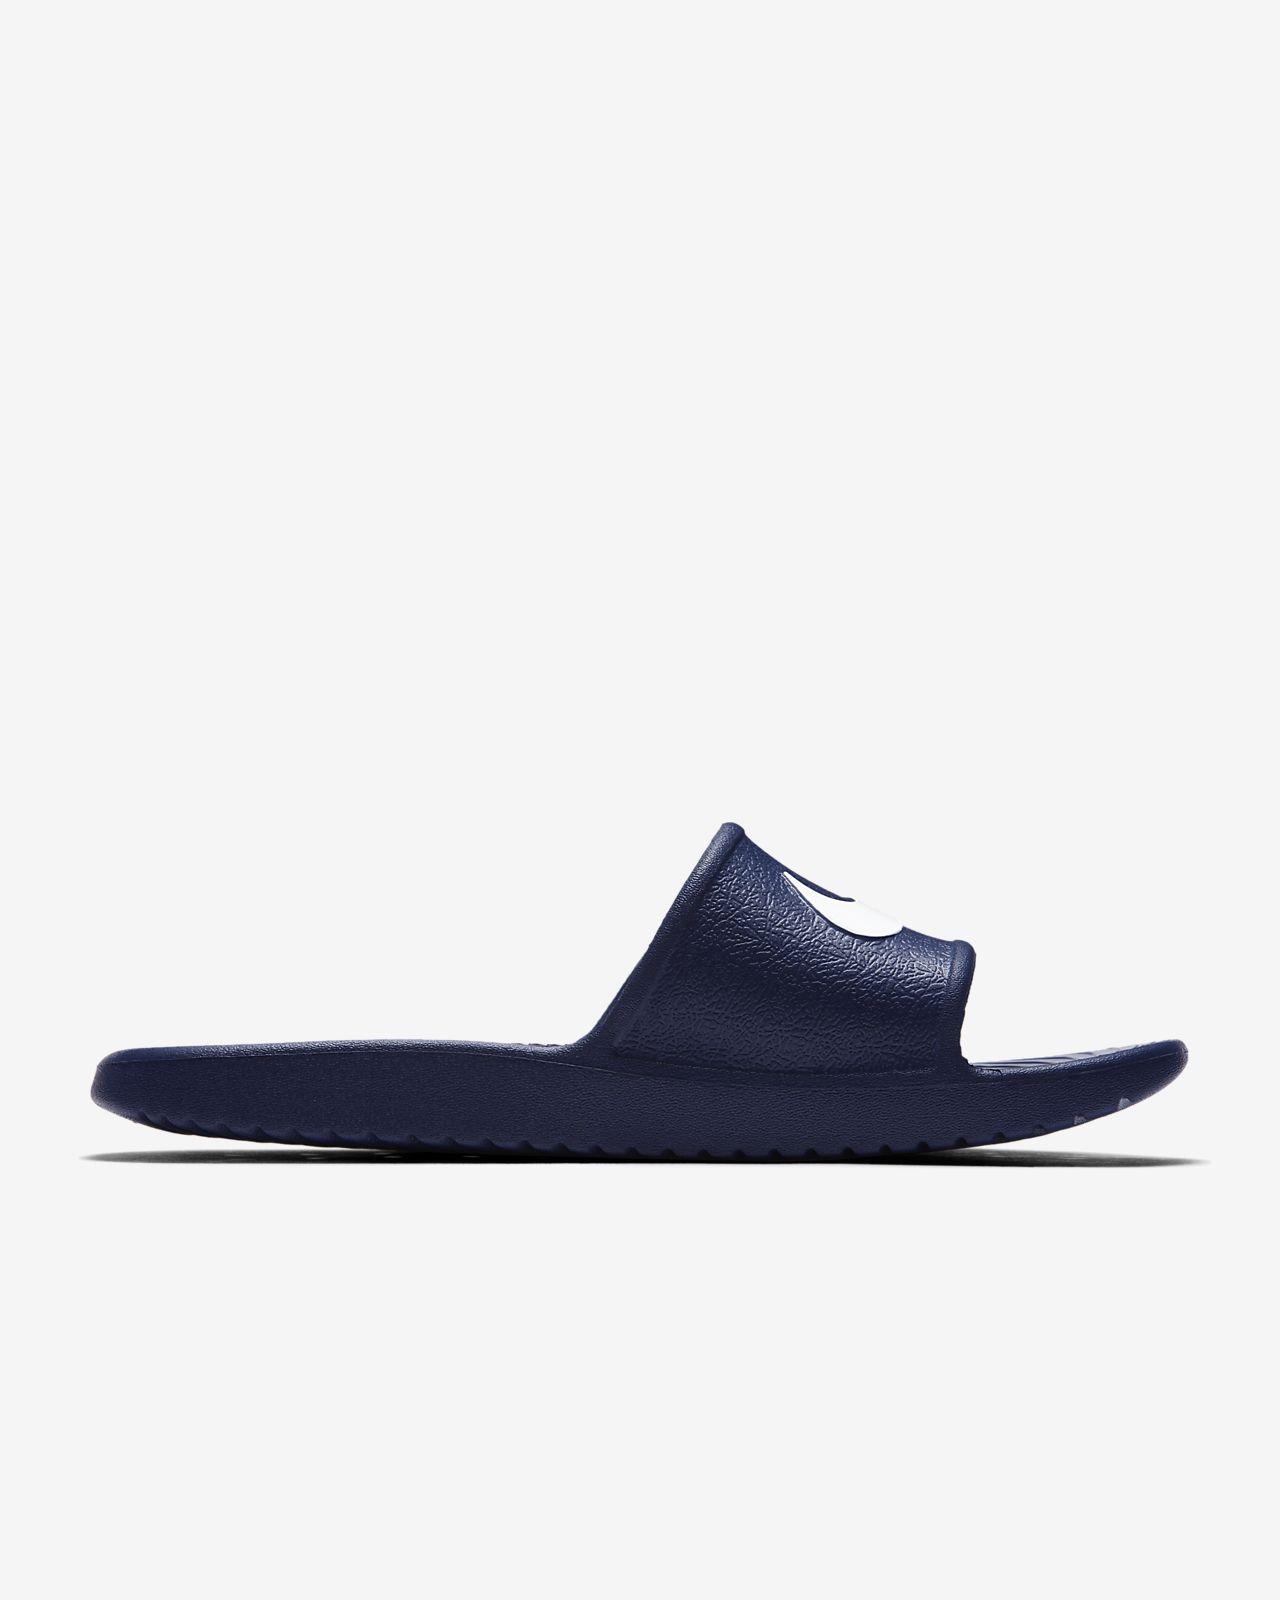 5236a36c03a5d2 Nike Kawa Shower Men s Slide. Nike.com GB